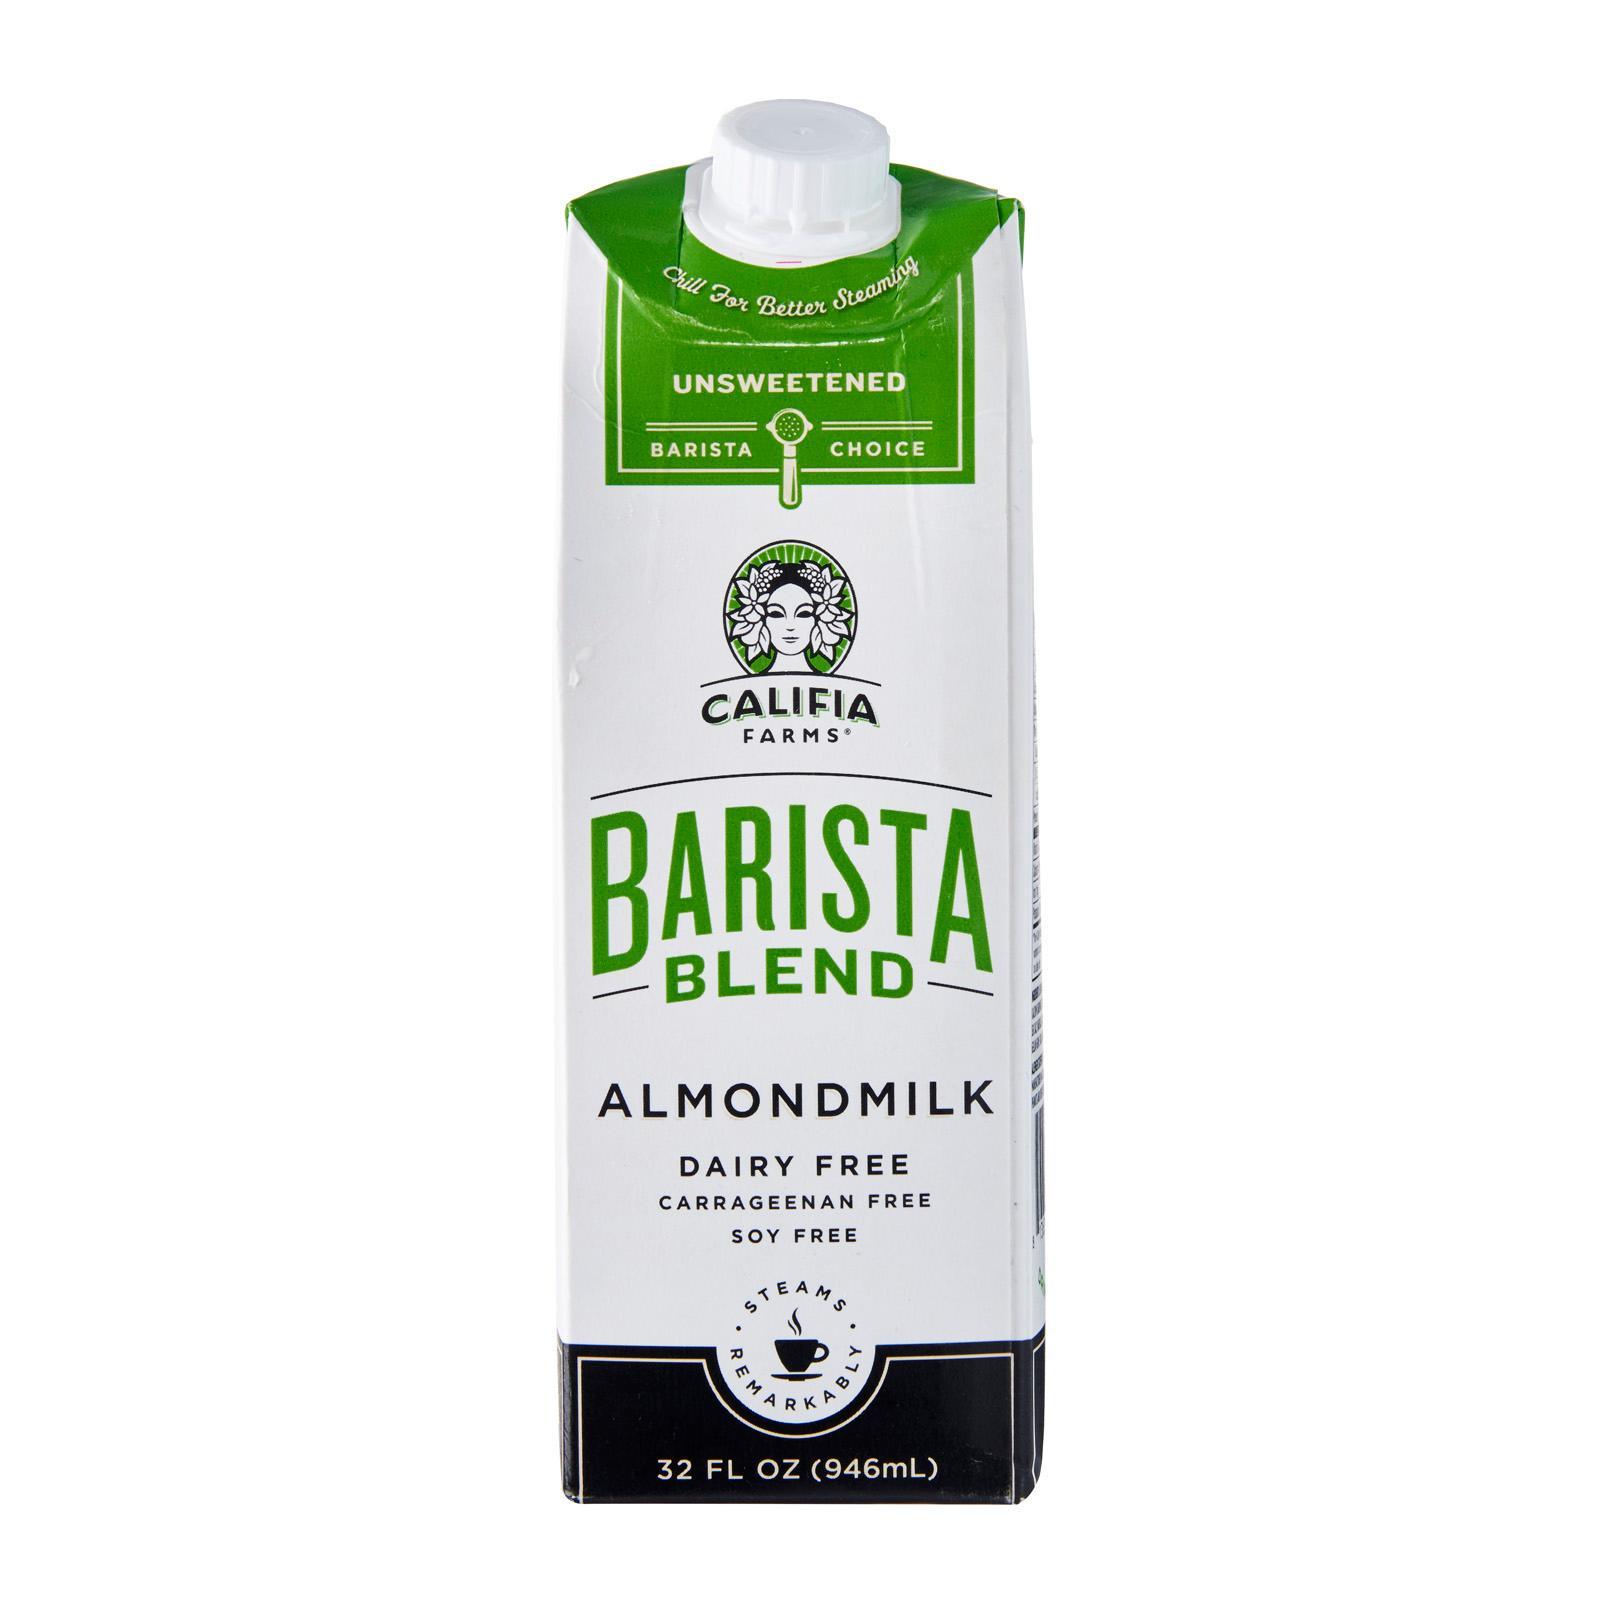 Califia Farms Unsweetened Barista Blend Almond Milk